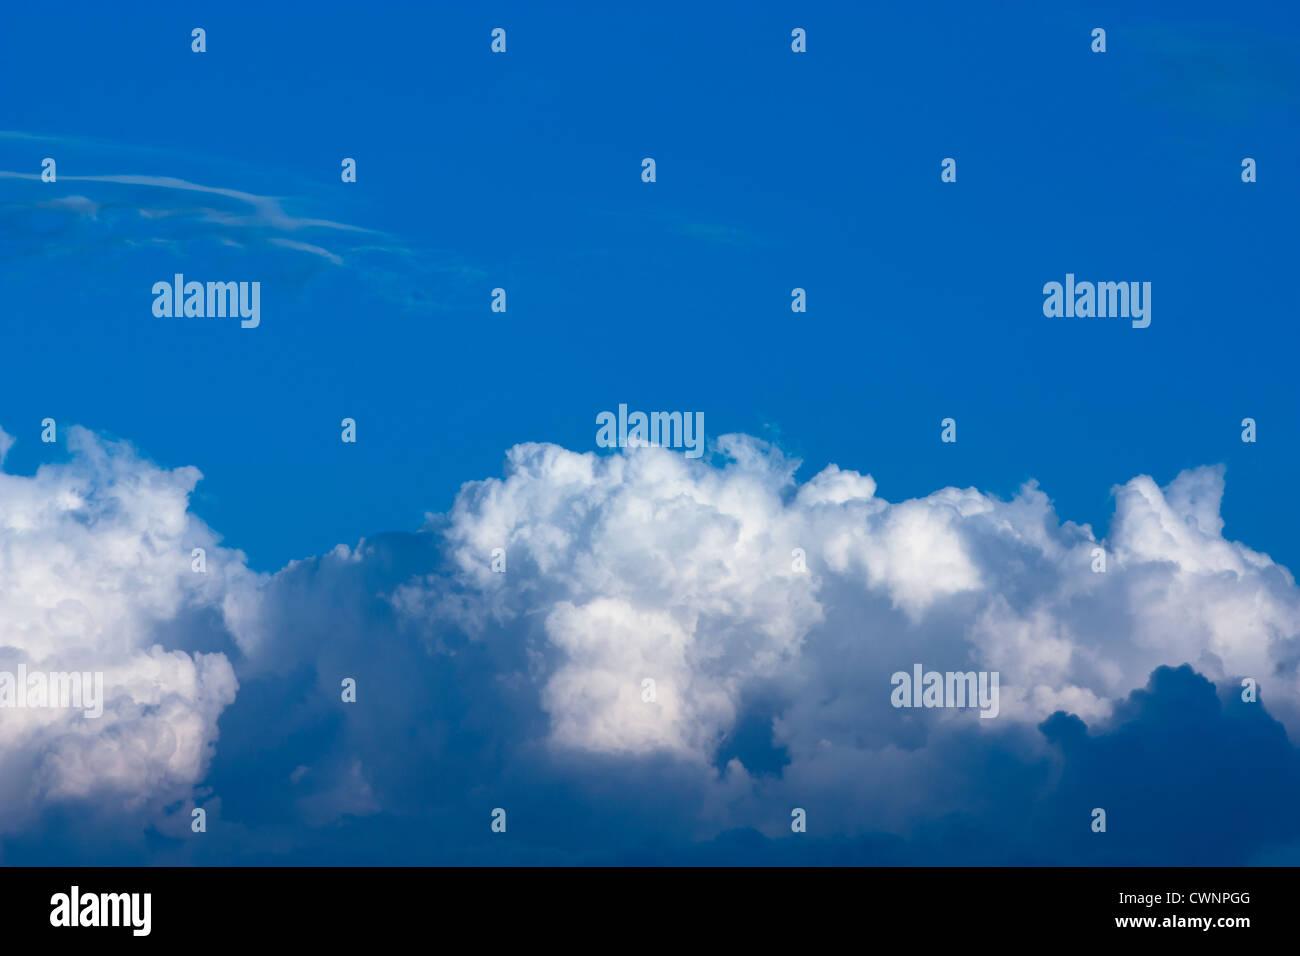 Wolken, Wolkenbank, Blauer Himmel, Clouds, Cloudbank, Blue Sky - Stock Image